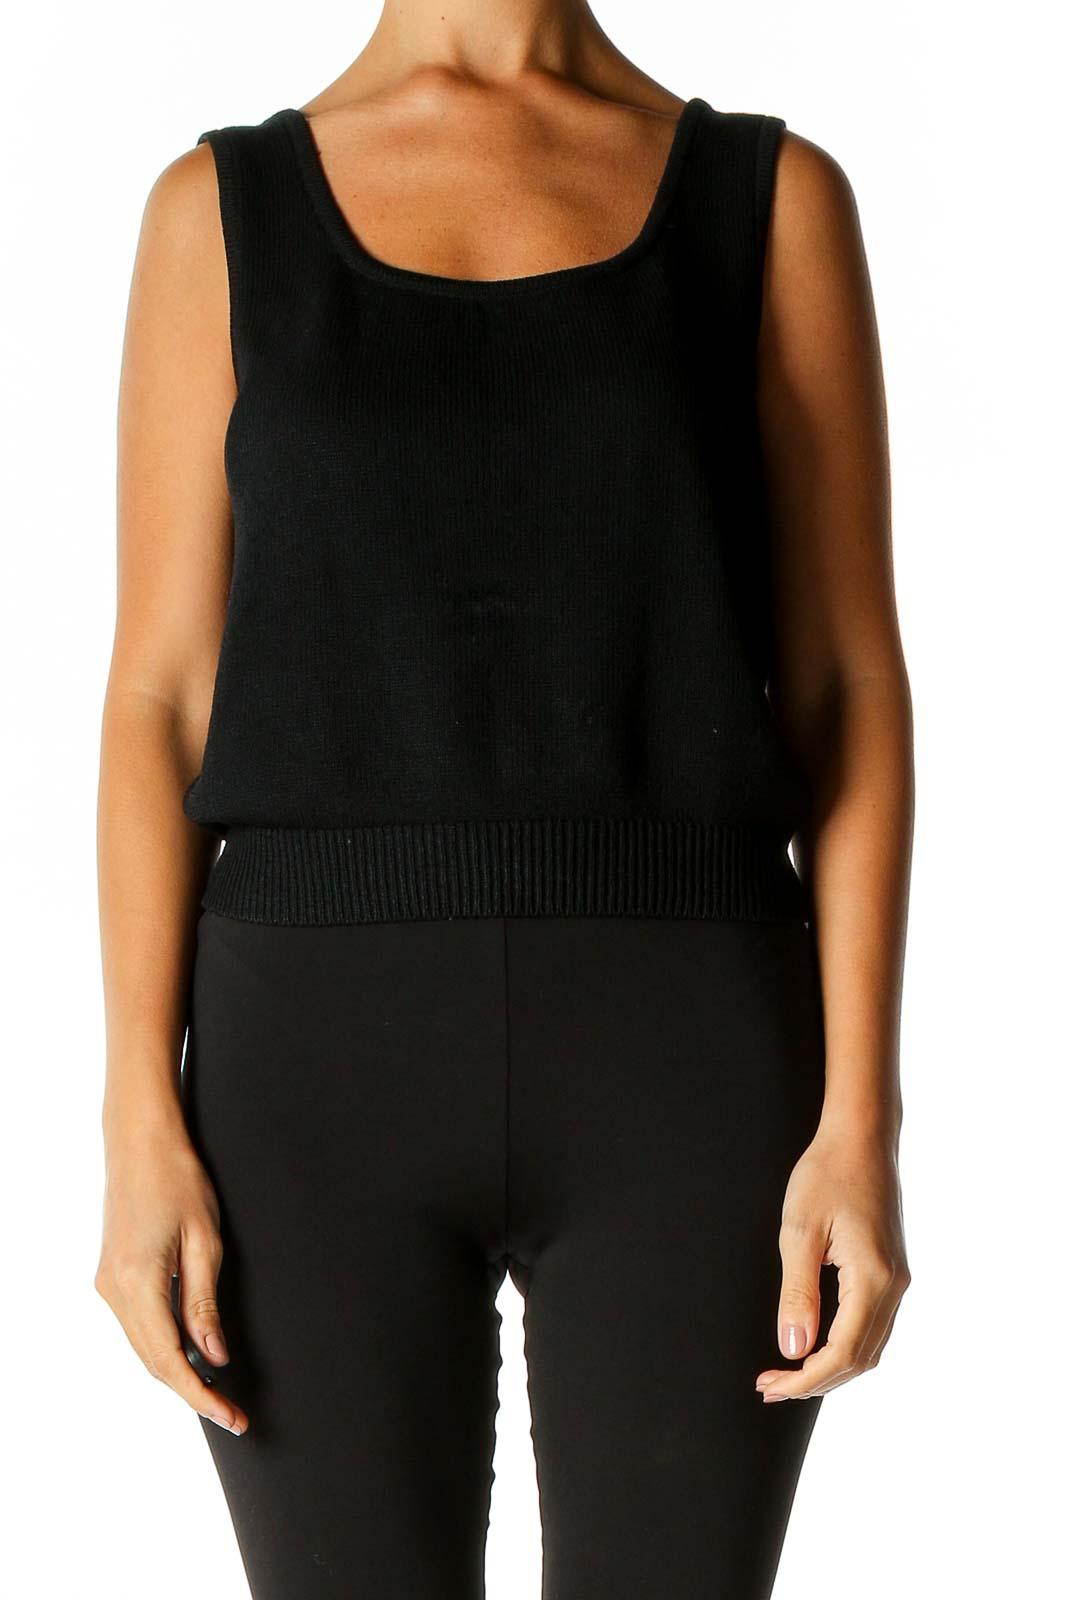 Black Solid Retro Sweater Front